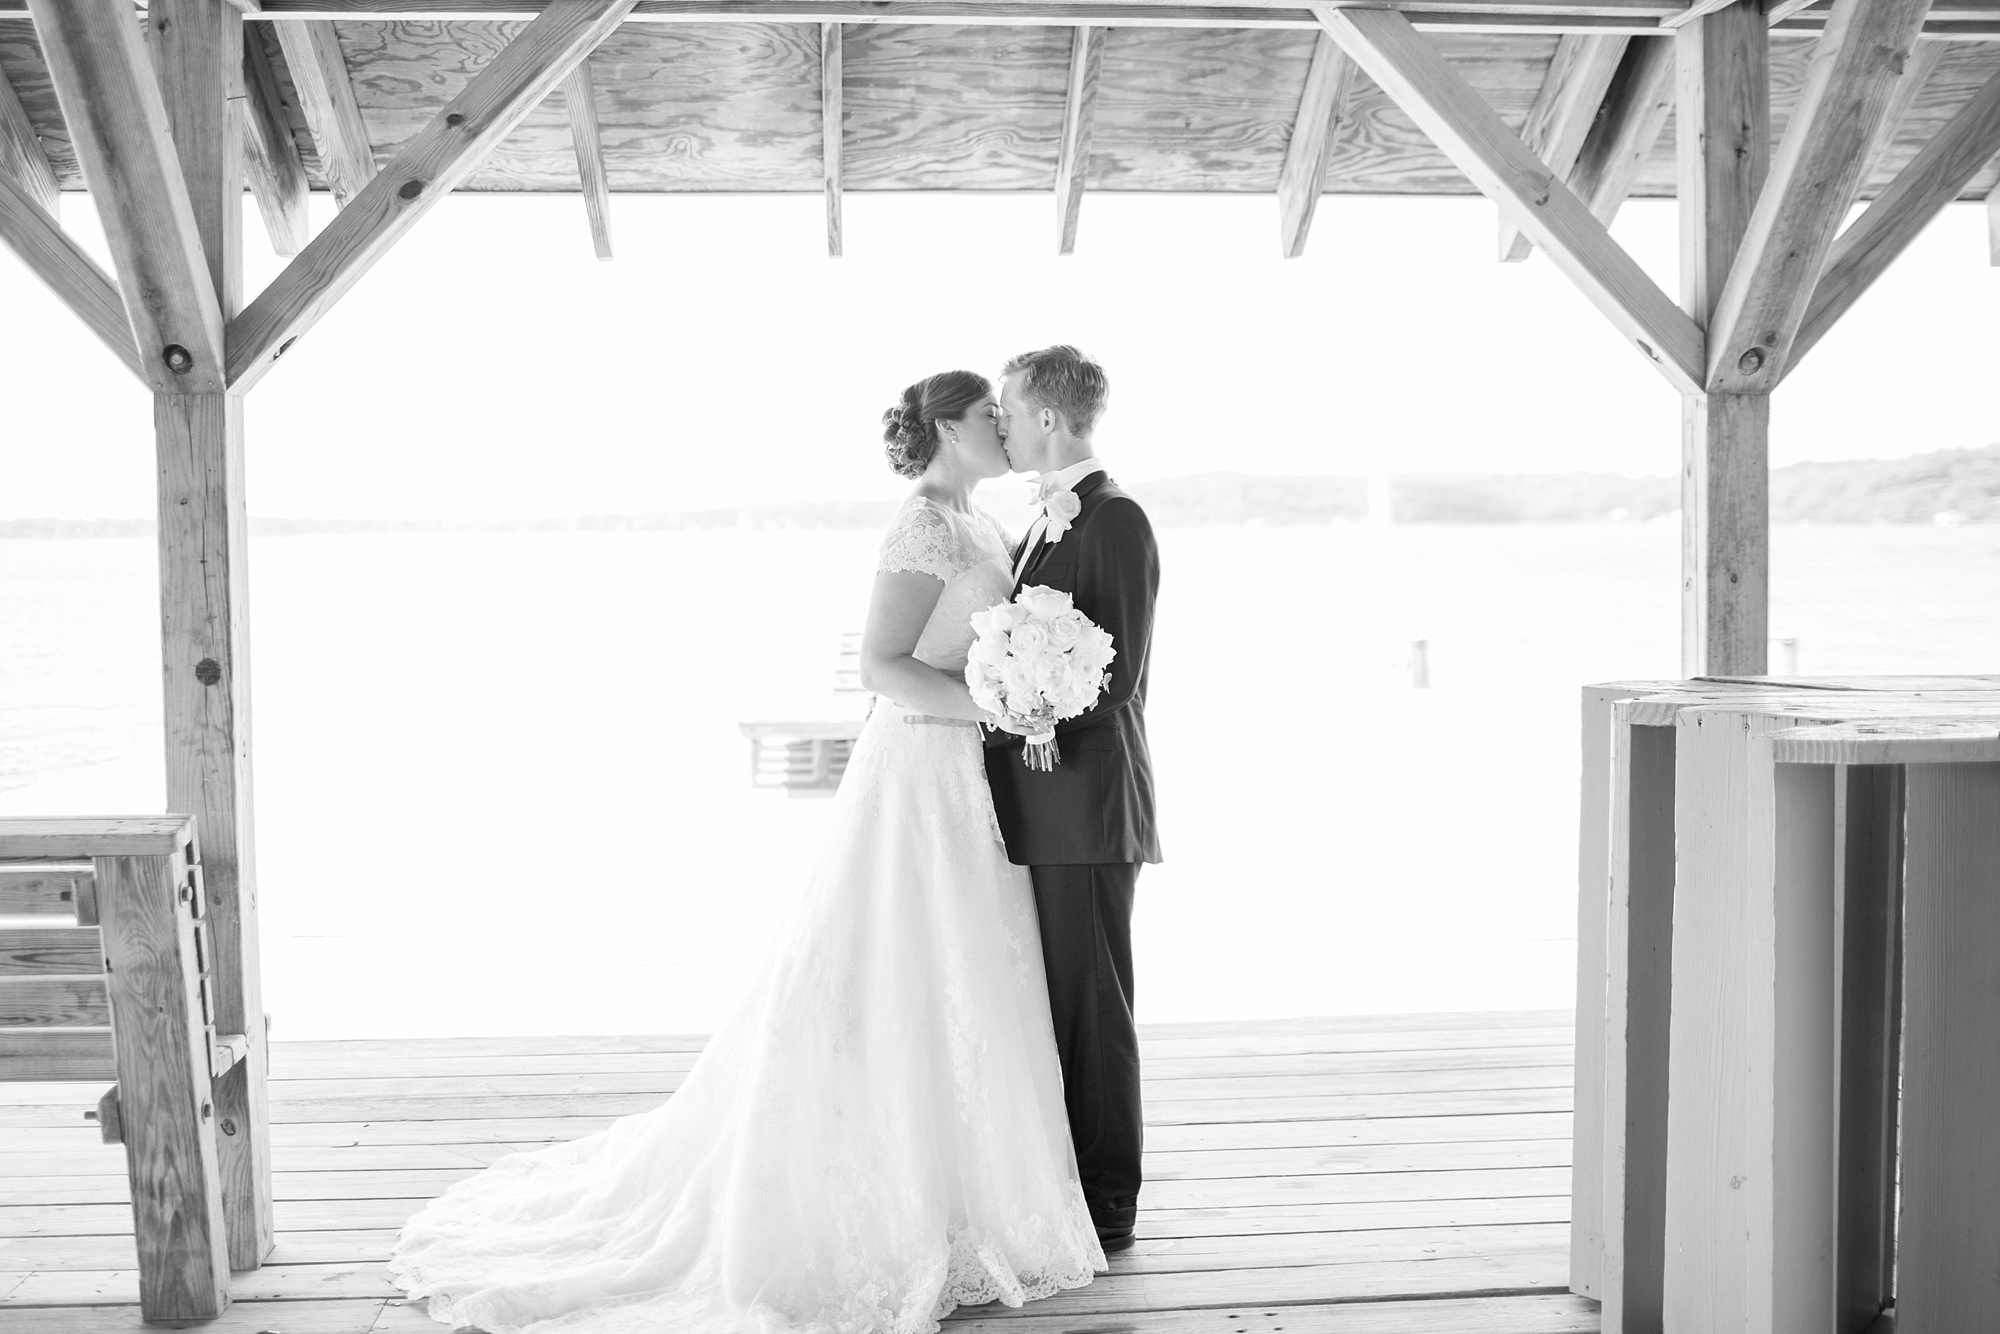 Somerville 4-Bride & Groom Portraits-1013_anna grace photography sherwood forest annapolis maryland wedding photographer photo.jpg